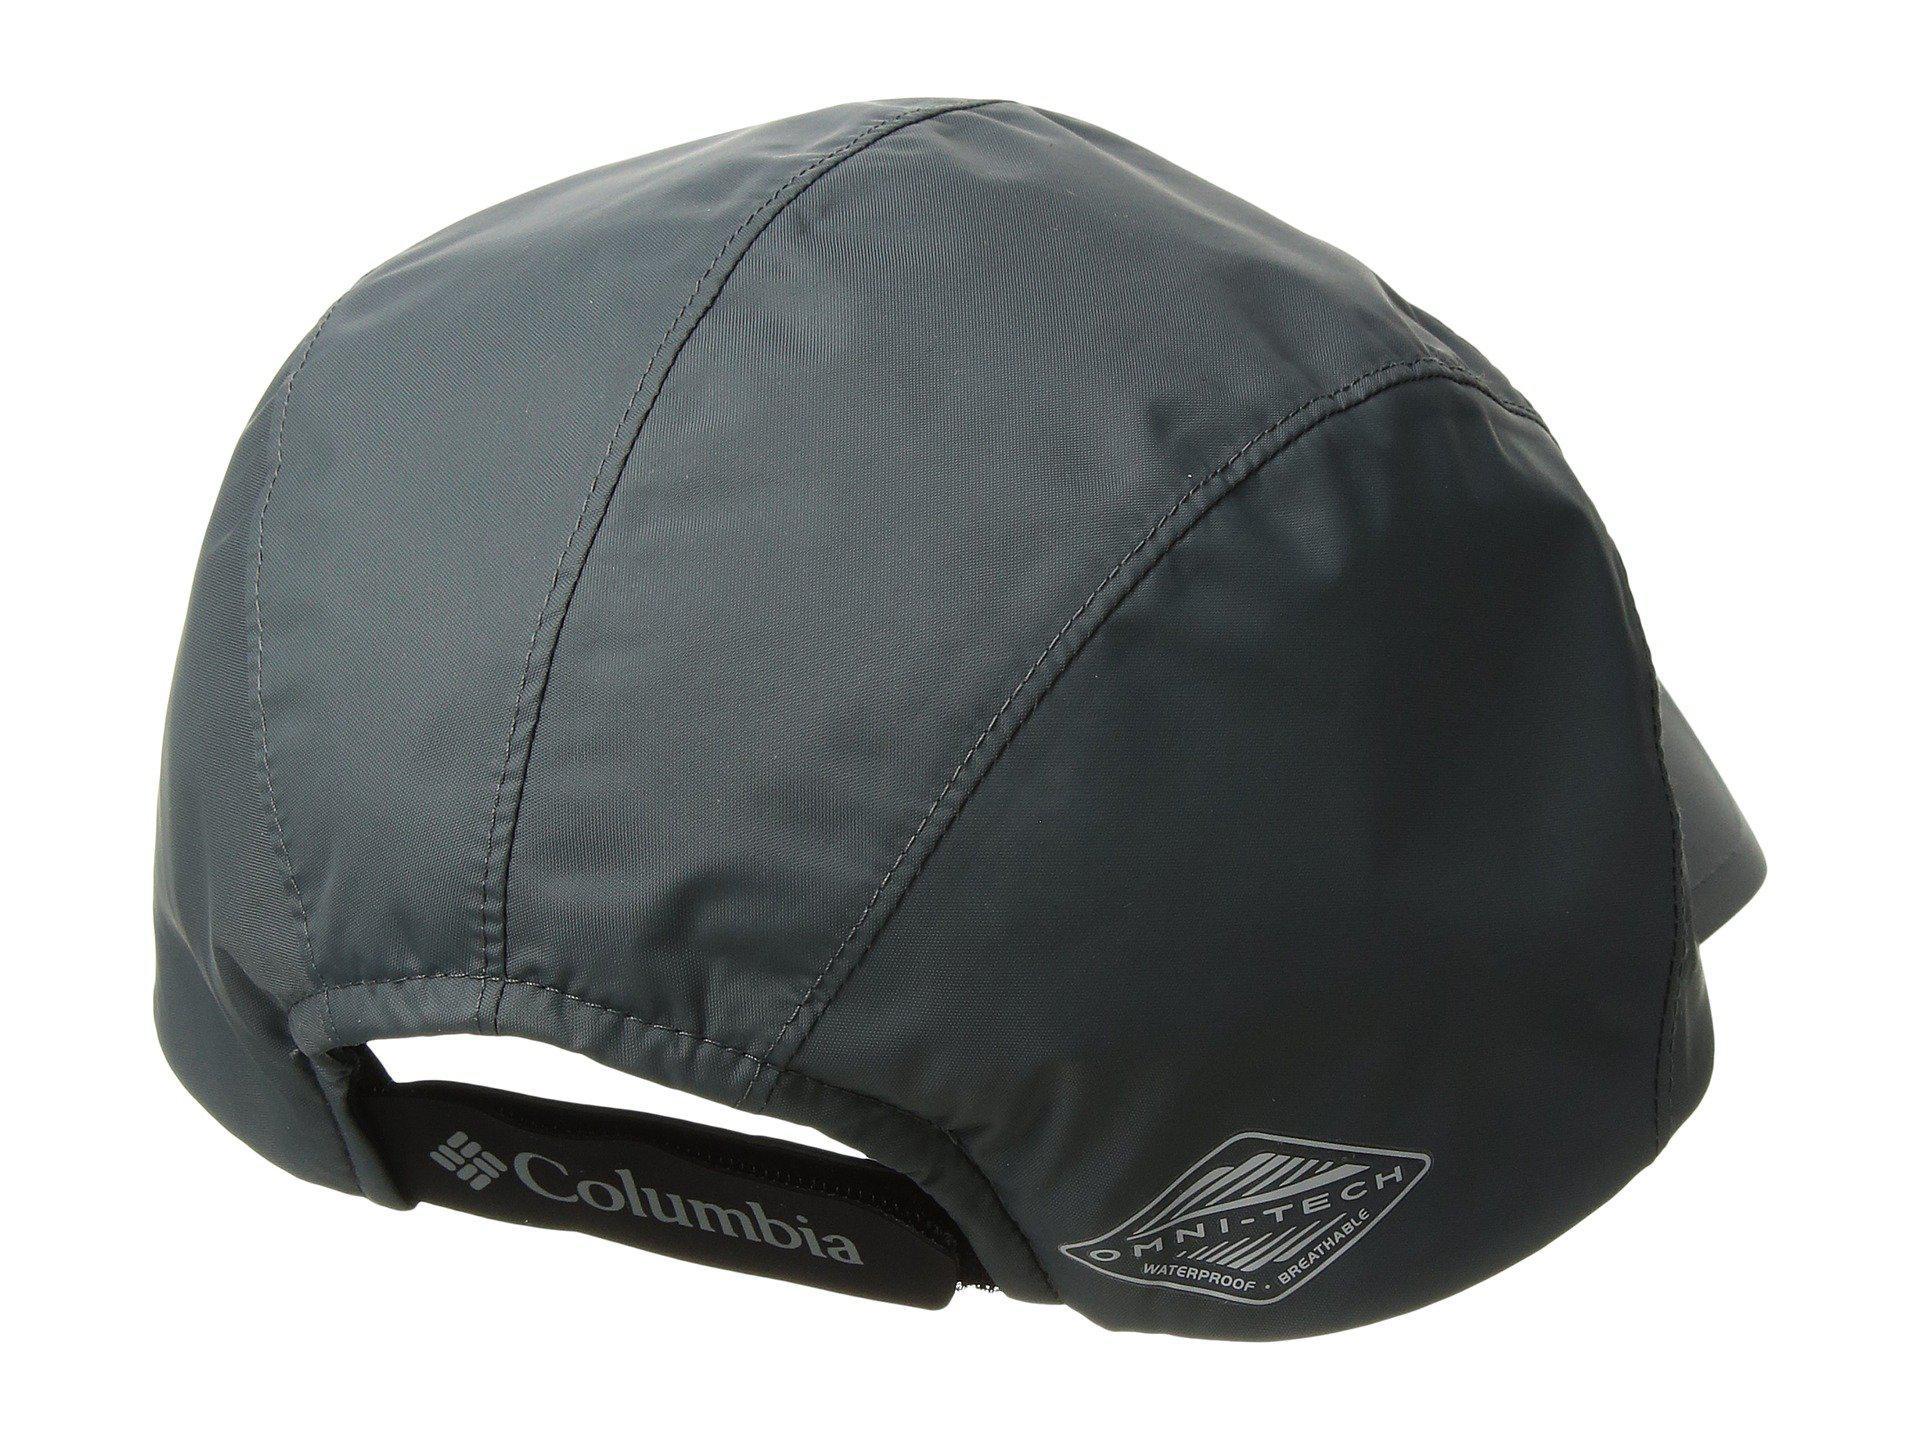 Lyst - Columbia Watertighttm Cap (graphite  Grey) Caps in Gray for Men fe9a0085eda